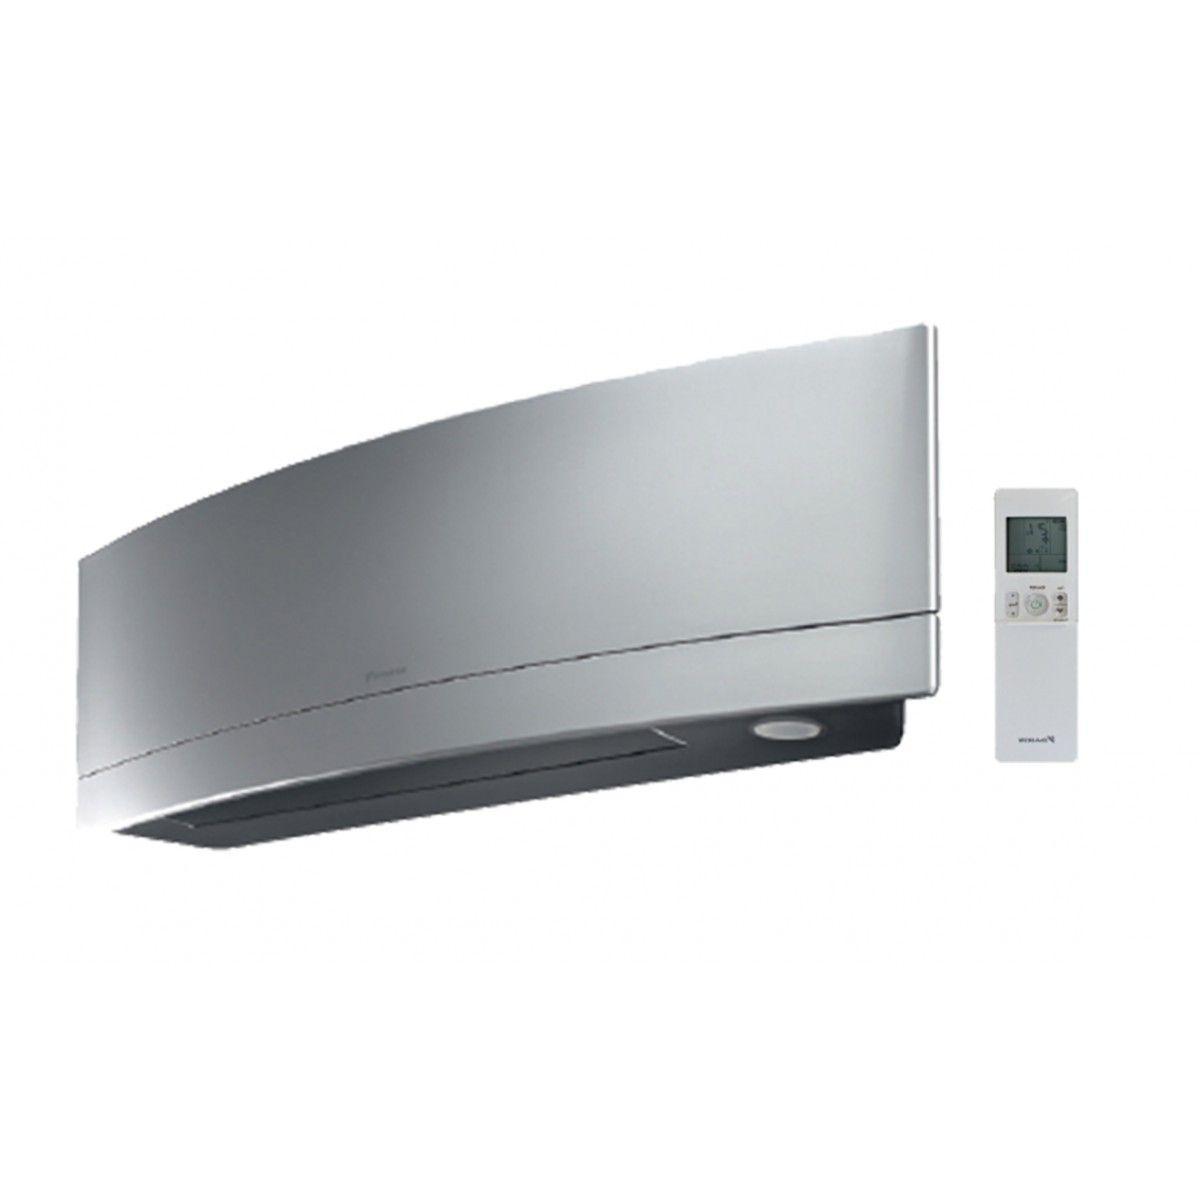 Daikin Emura 12k Btu Wall Mount Indoor Air Handler Silver